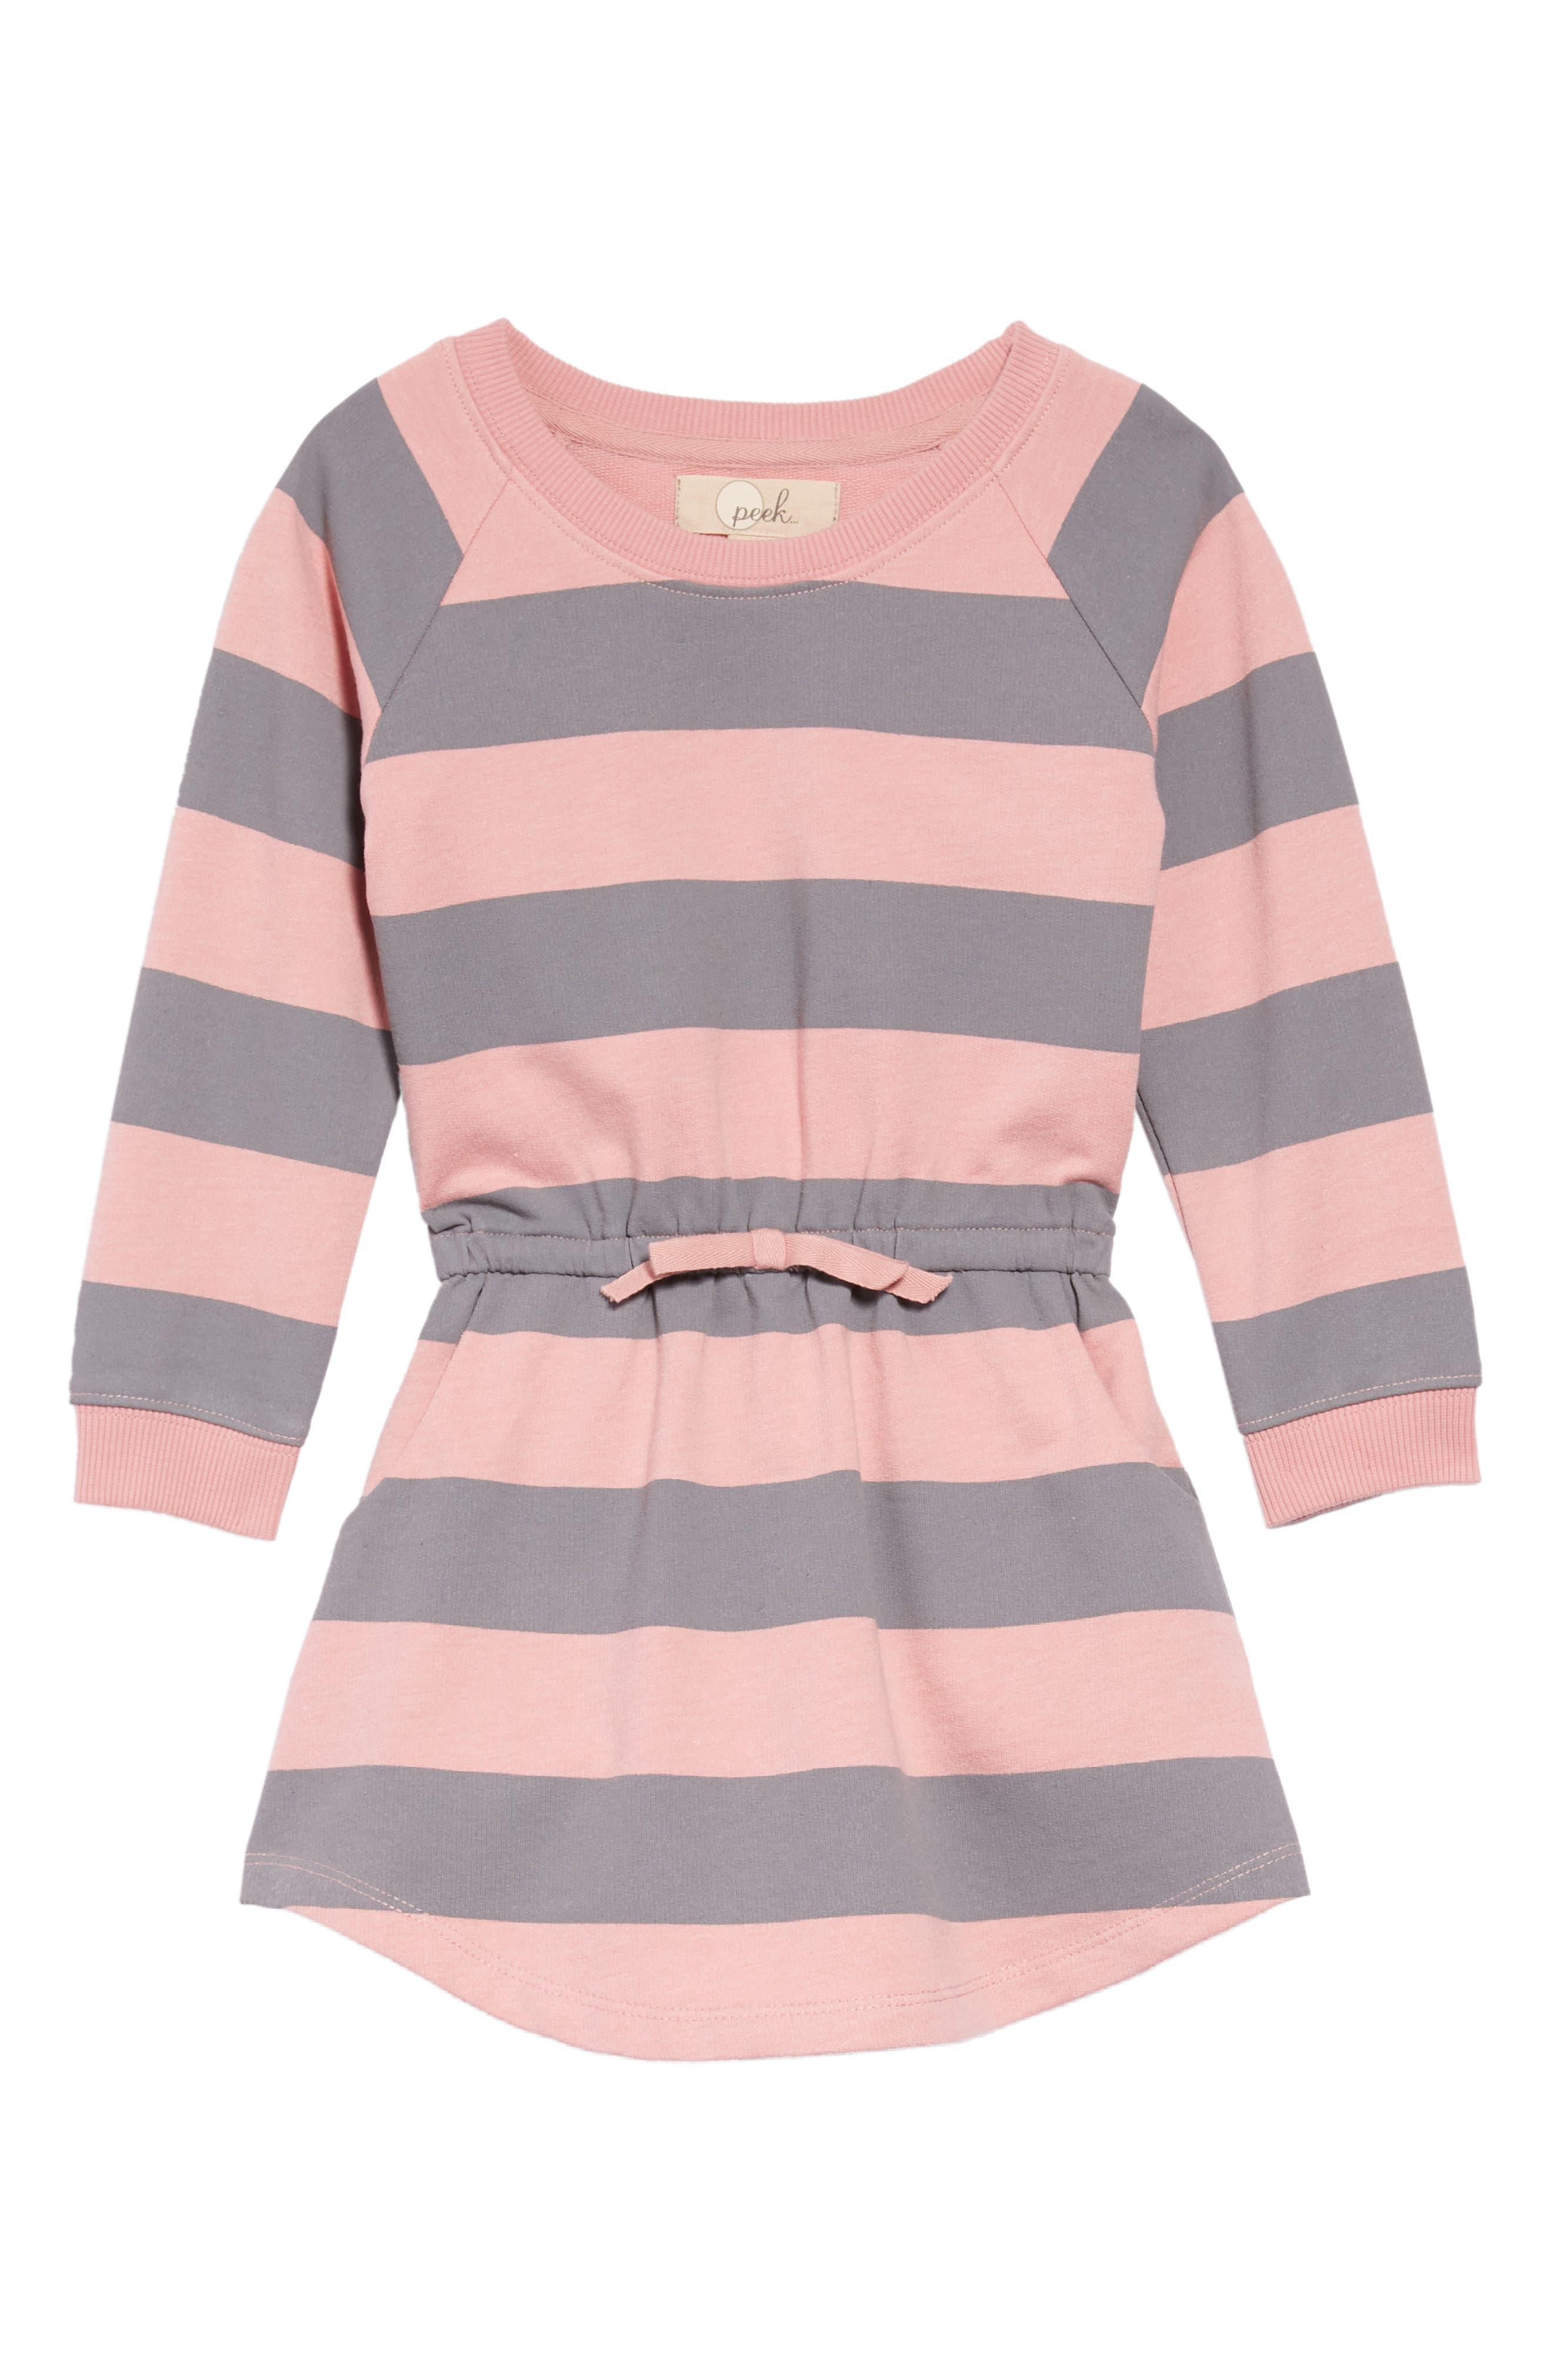 Ruby Sweatshirt Dress,                         Main,                         color, PINK